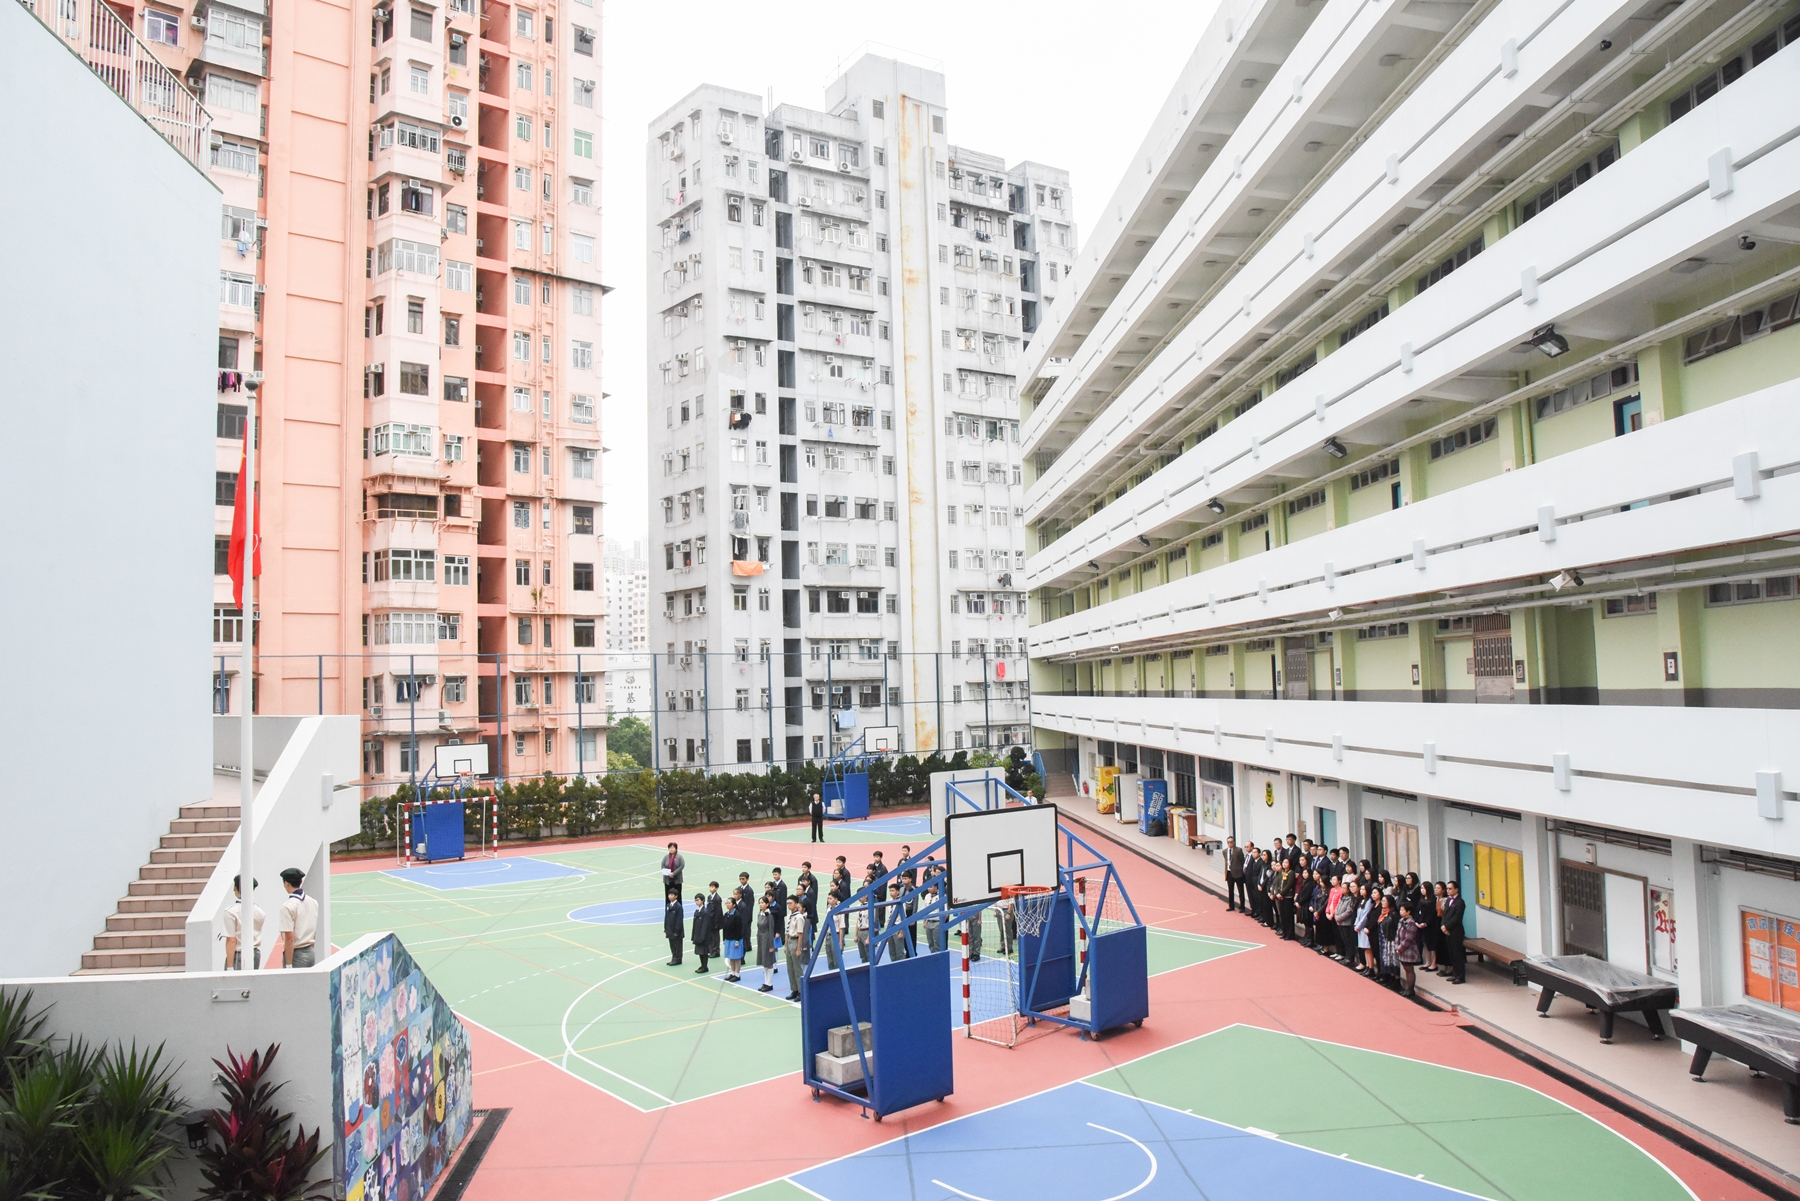 http://npc.edu.hk/sites/default/files/dsc_2571.jpg